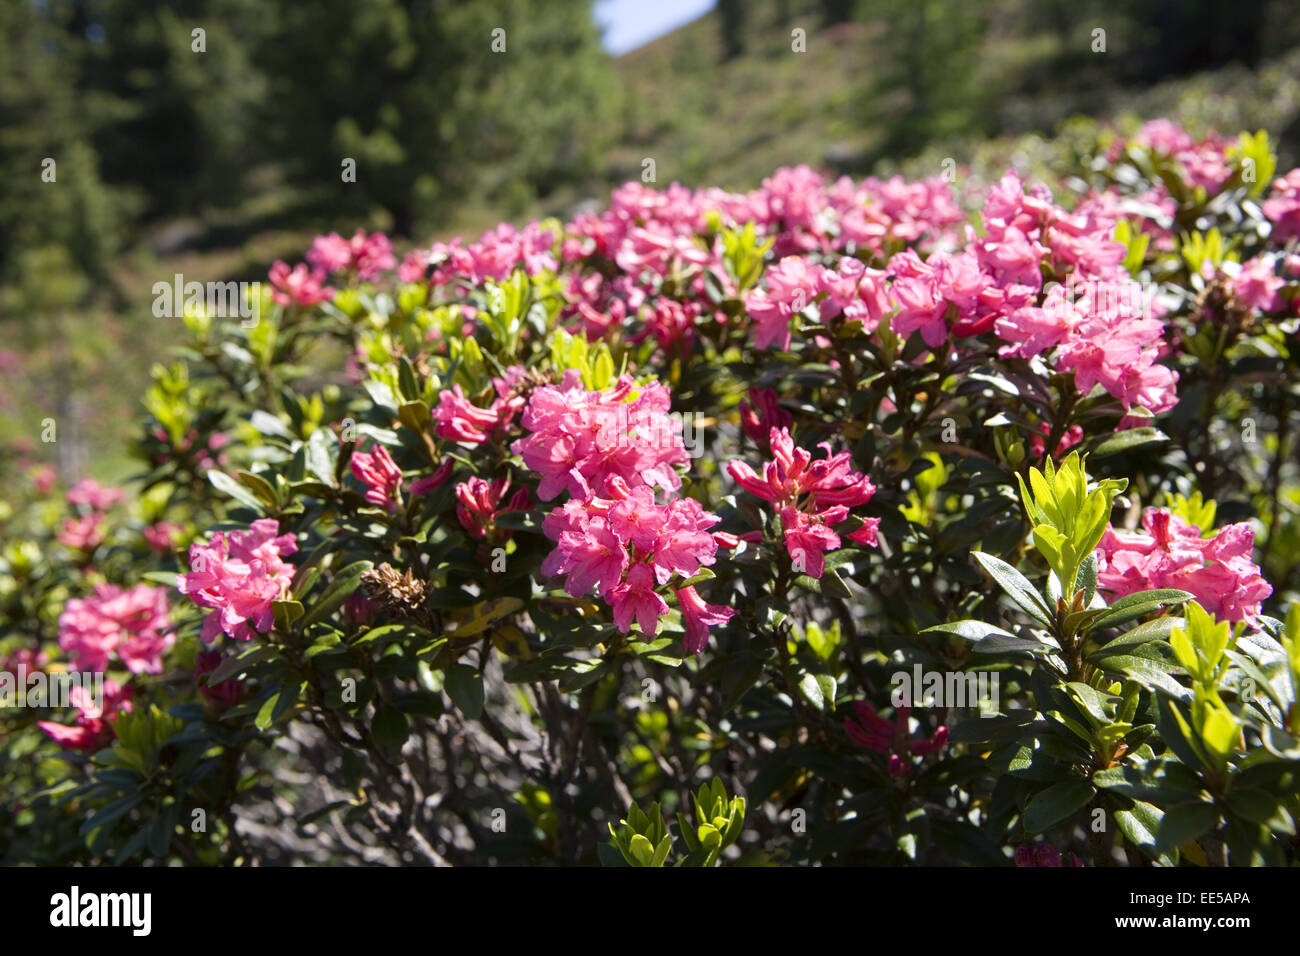 Alpenrose, Rhododendron, close-up, Natur, Vegetation, Botanik, Bergregion, Alpenblume, Blume, Stiel, Bluete, rosa, - Stock Image